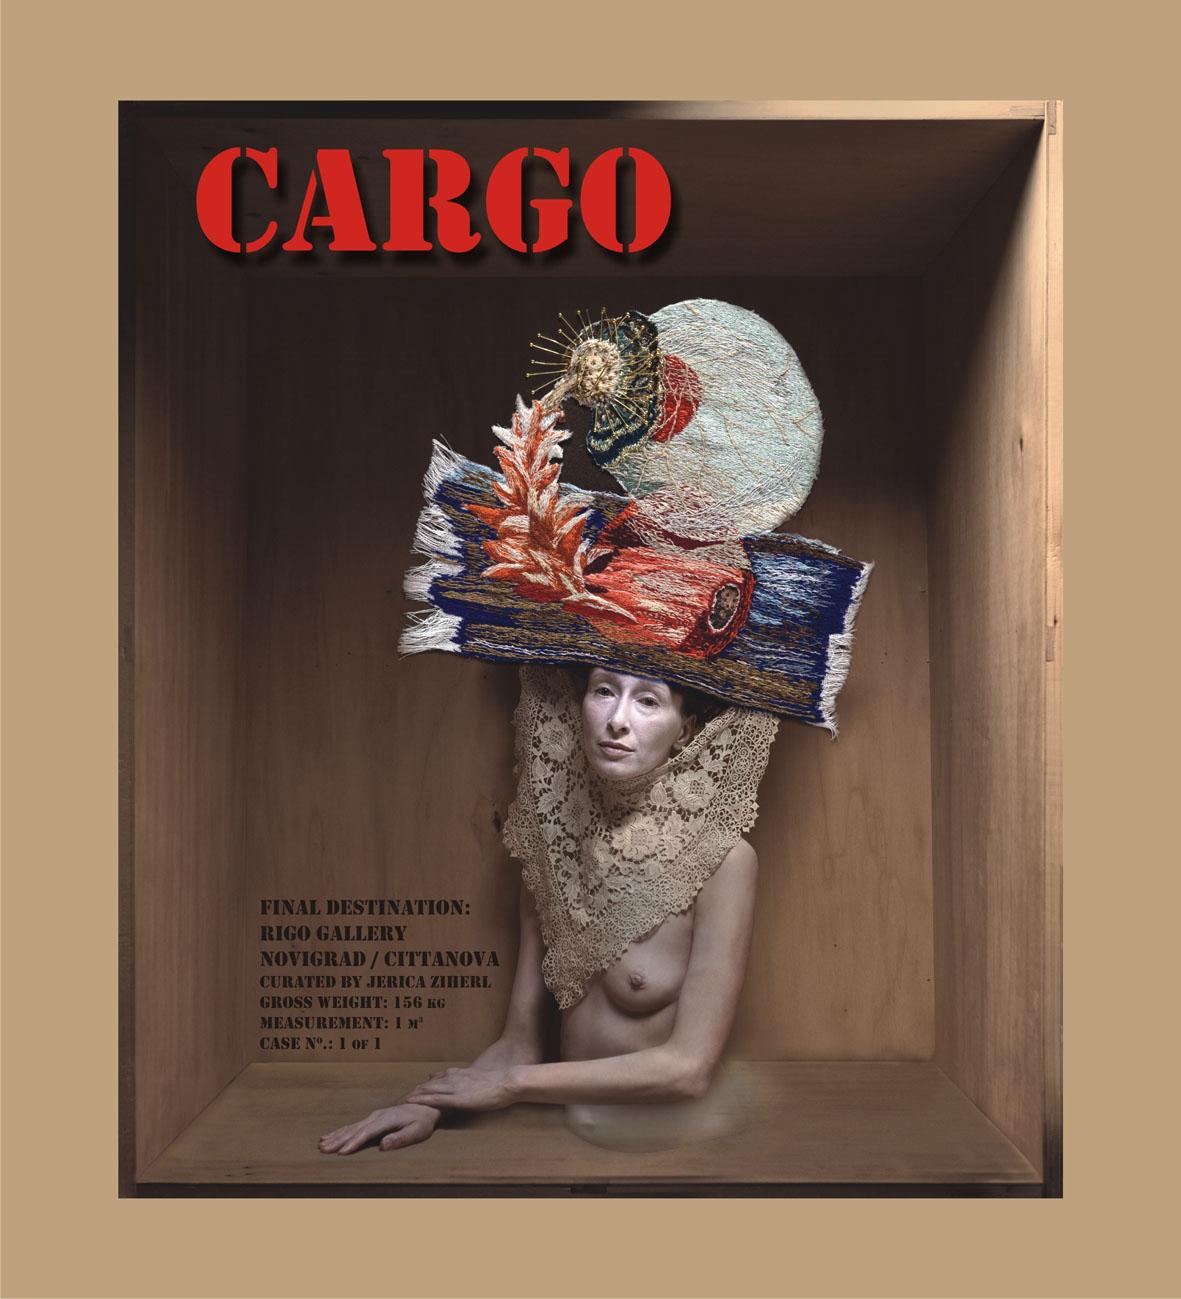 http://www.novigrad.hr/otvorenje_izlozhbe_ljiljana_petrovi_alaksandar_kosti_cargo